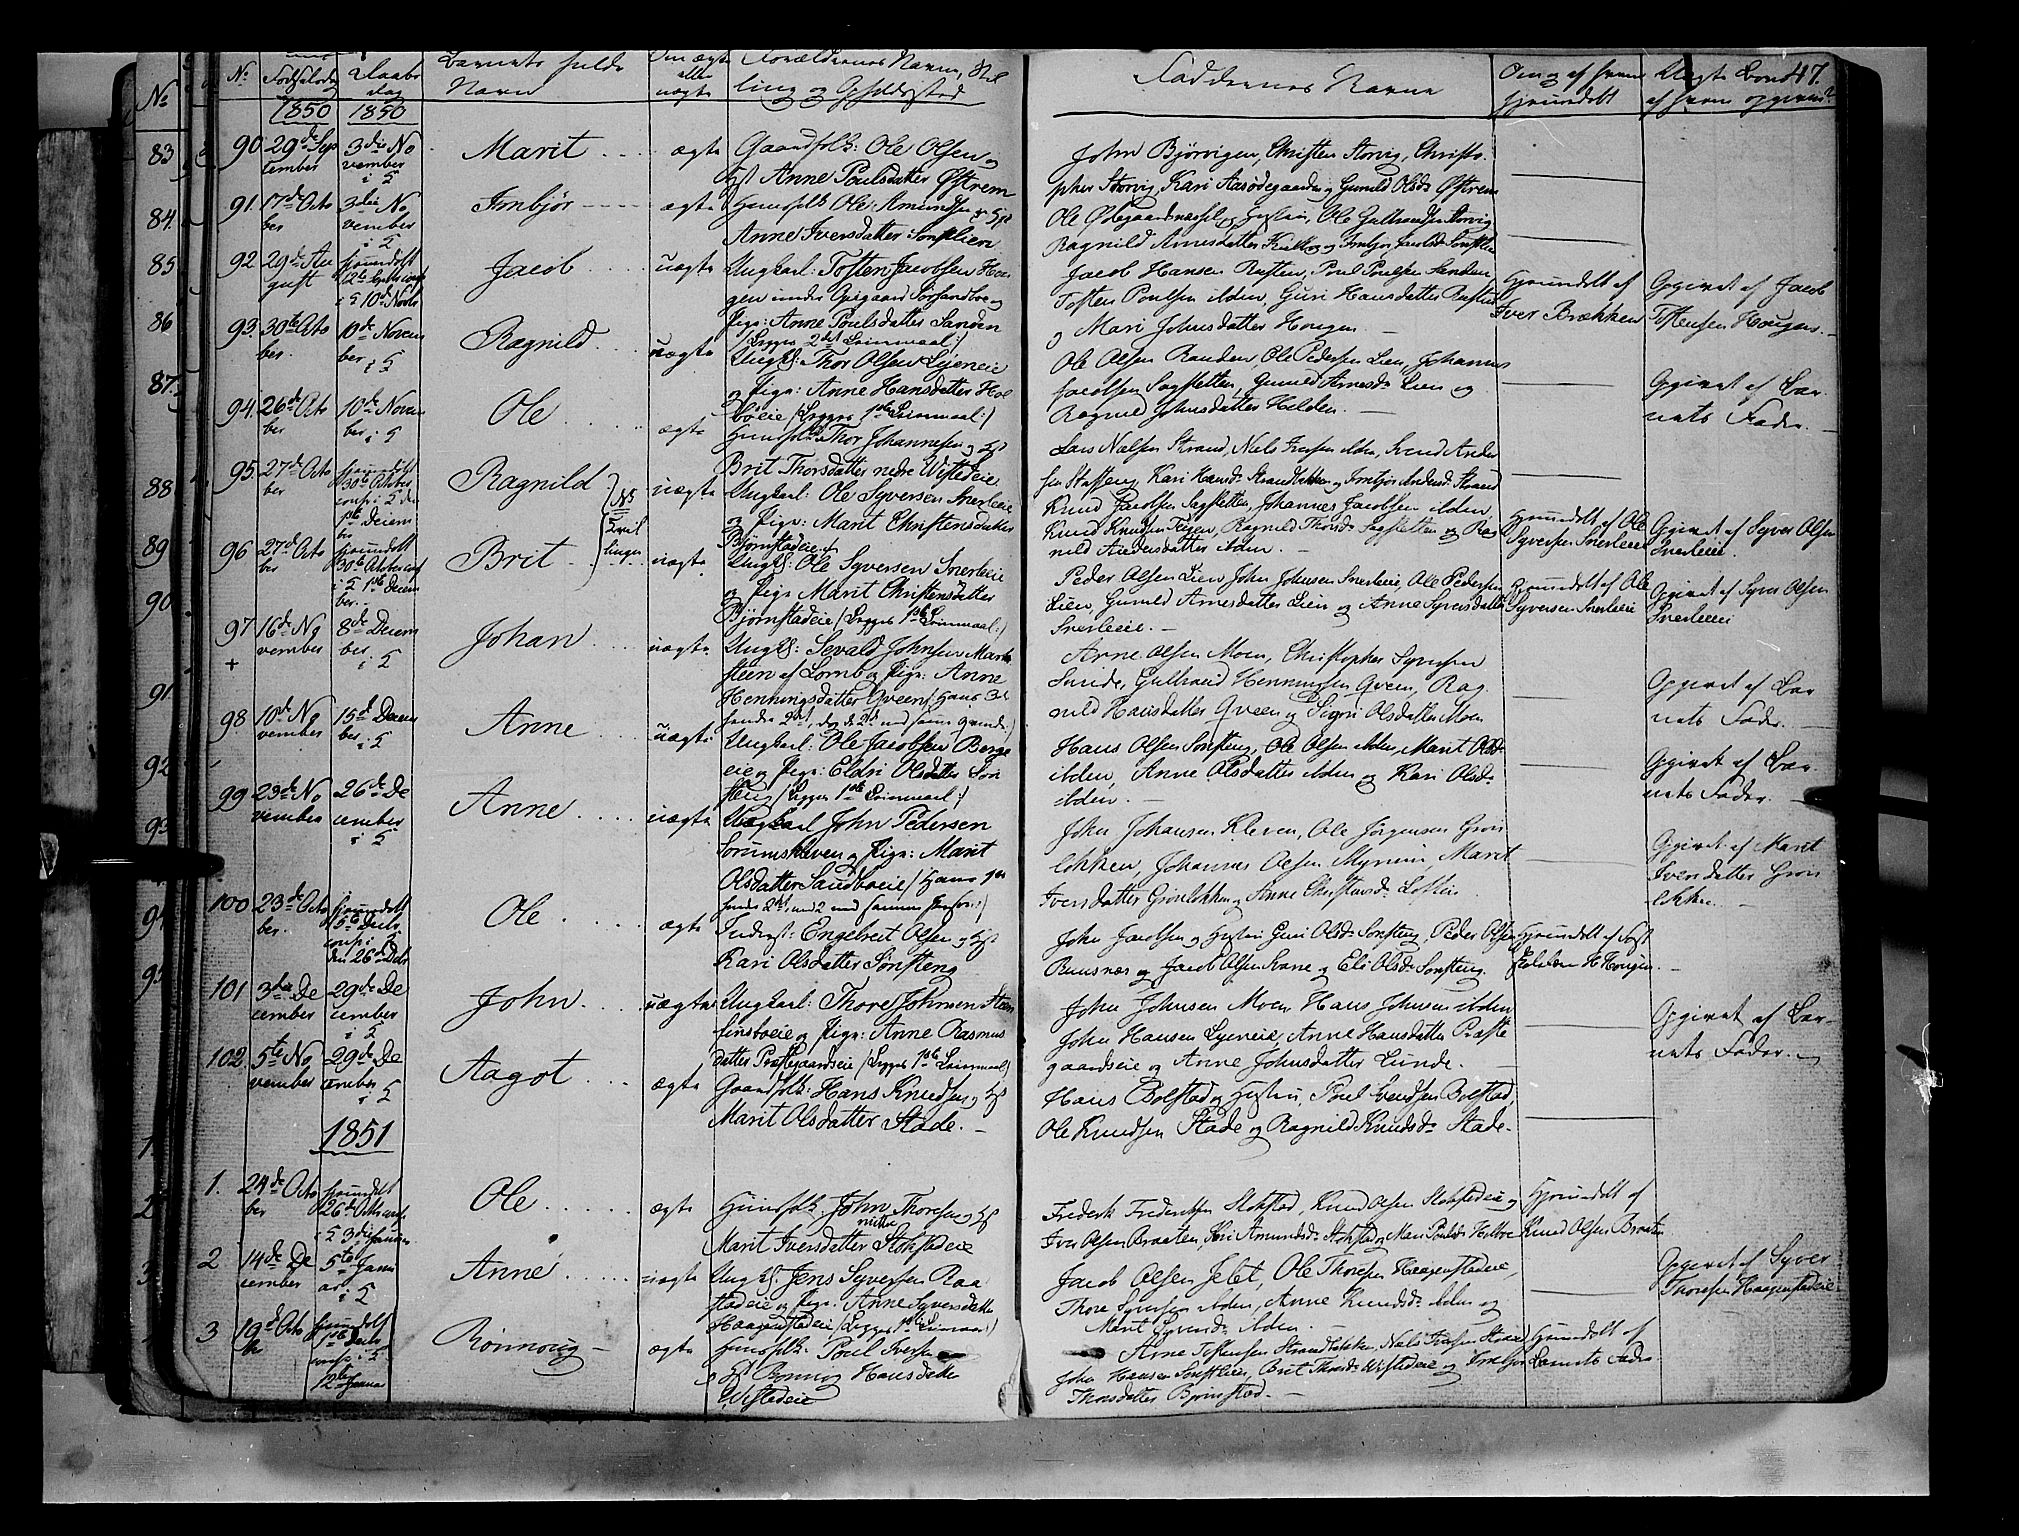 SAH, Vågå prestekontor, Ministerialbok nr. 5 /1, 1842-1856, s. 47